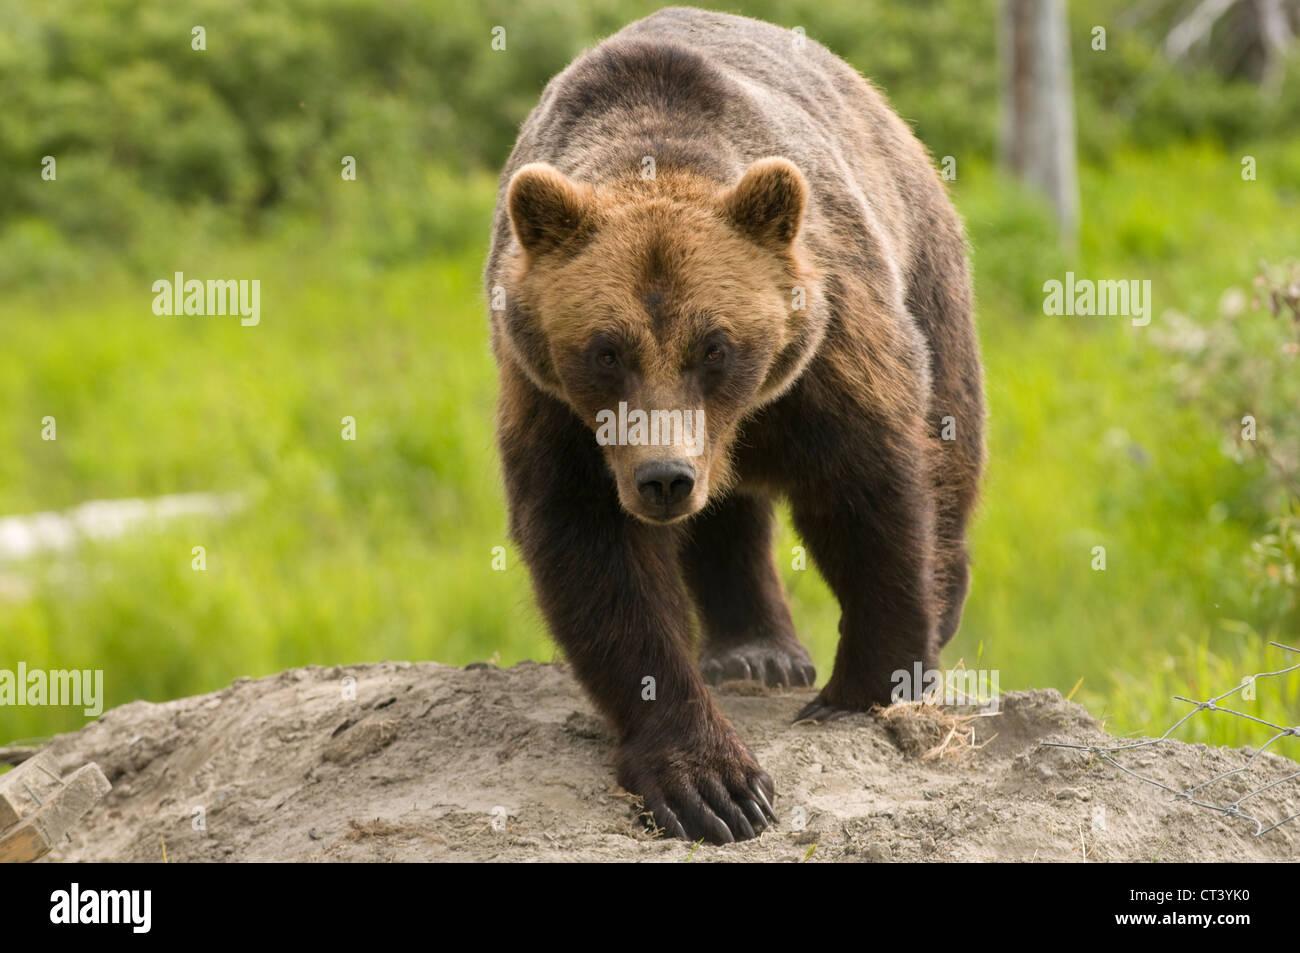 dangerous Alaskan Grizzly bear walking towards the viewer - Stock Image